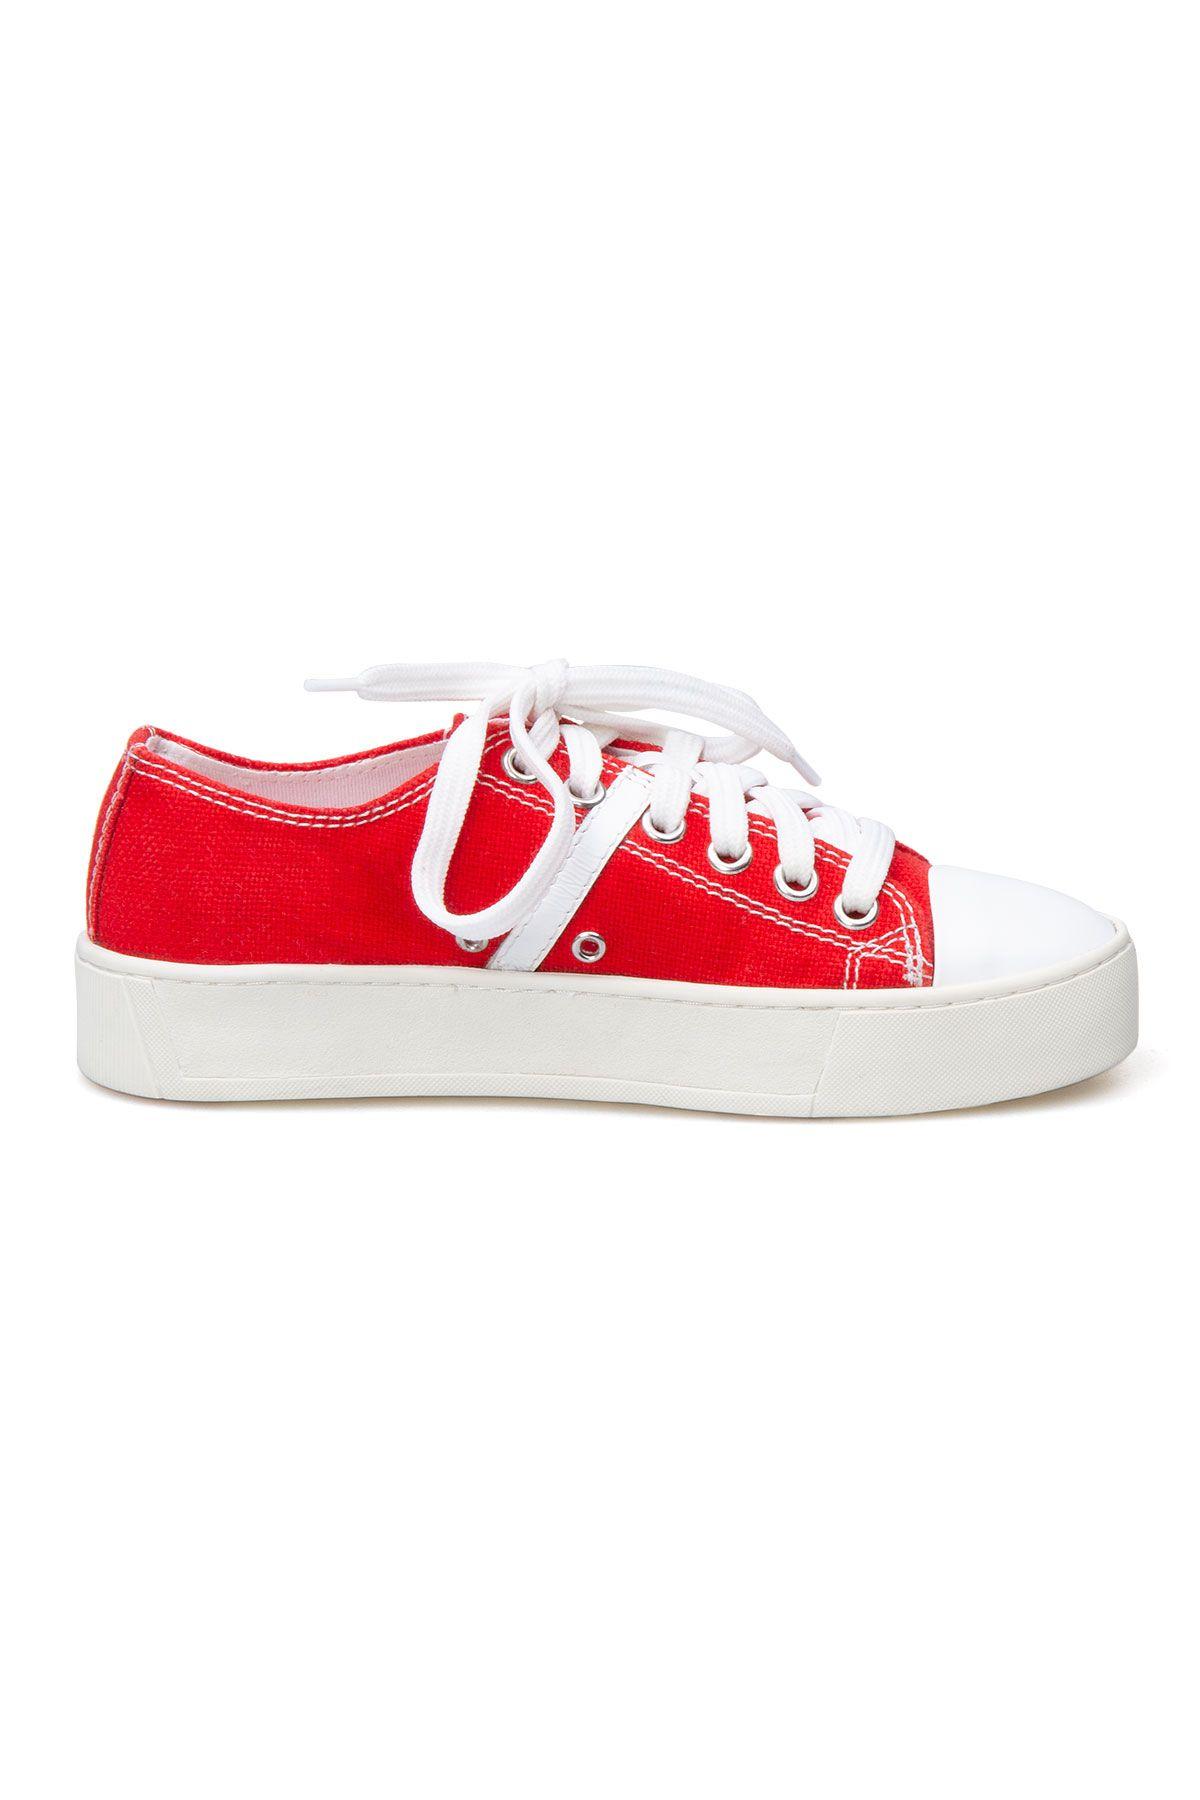 San Women's Sneaker SAN02S Red